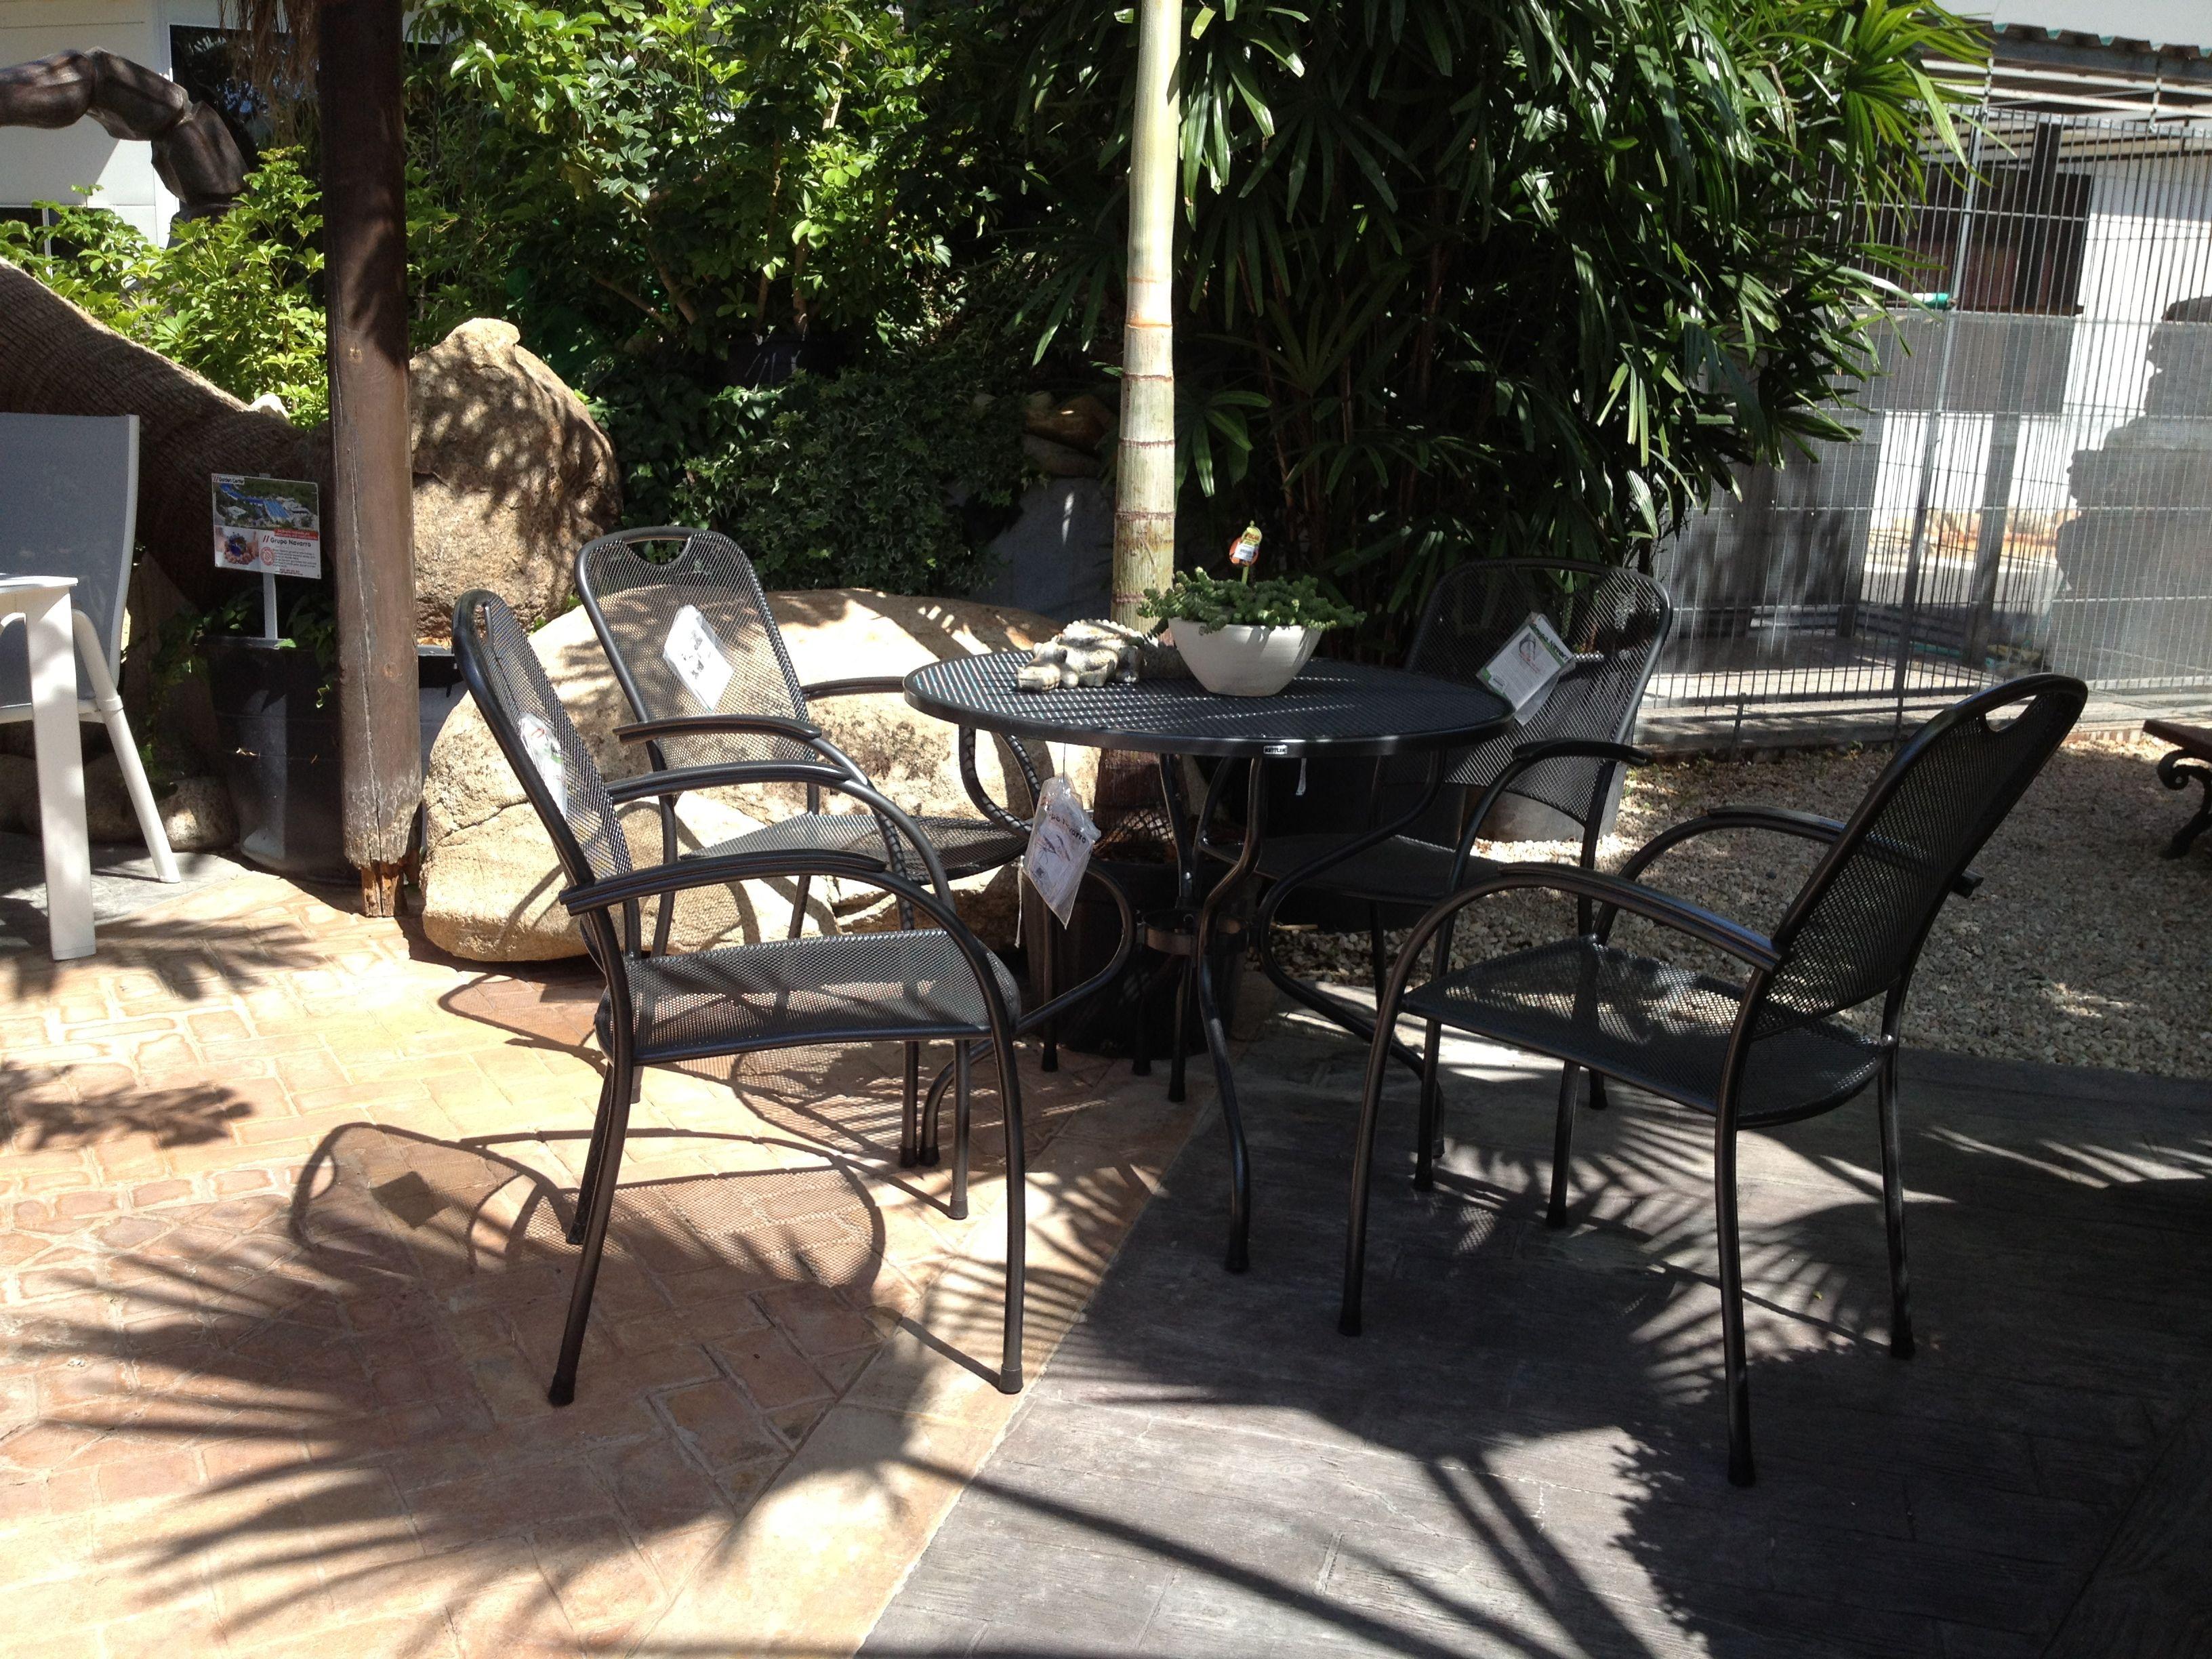 NUEVO: Muebles de jardín Kettler   Garden Center Navarro